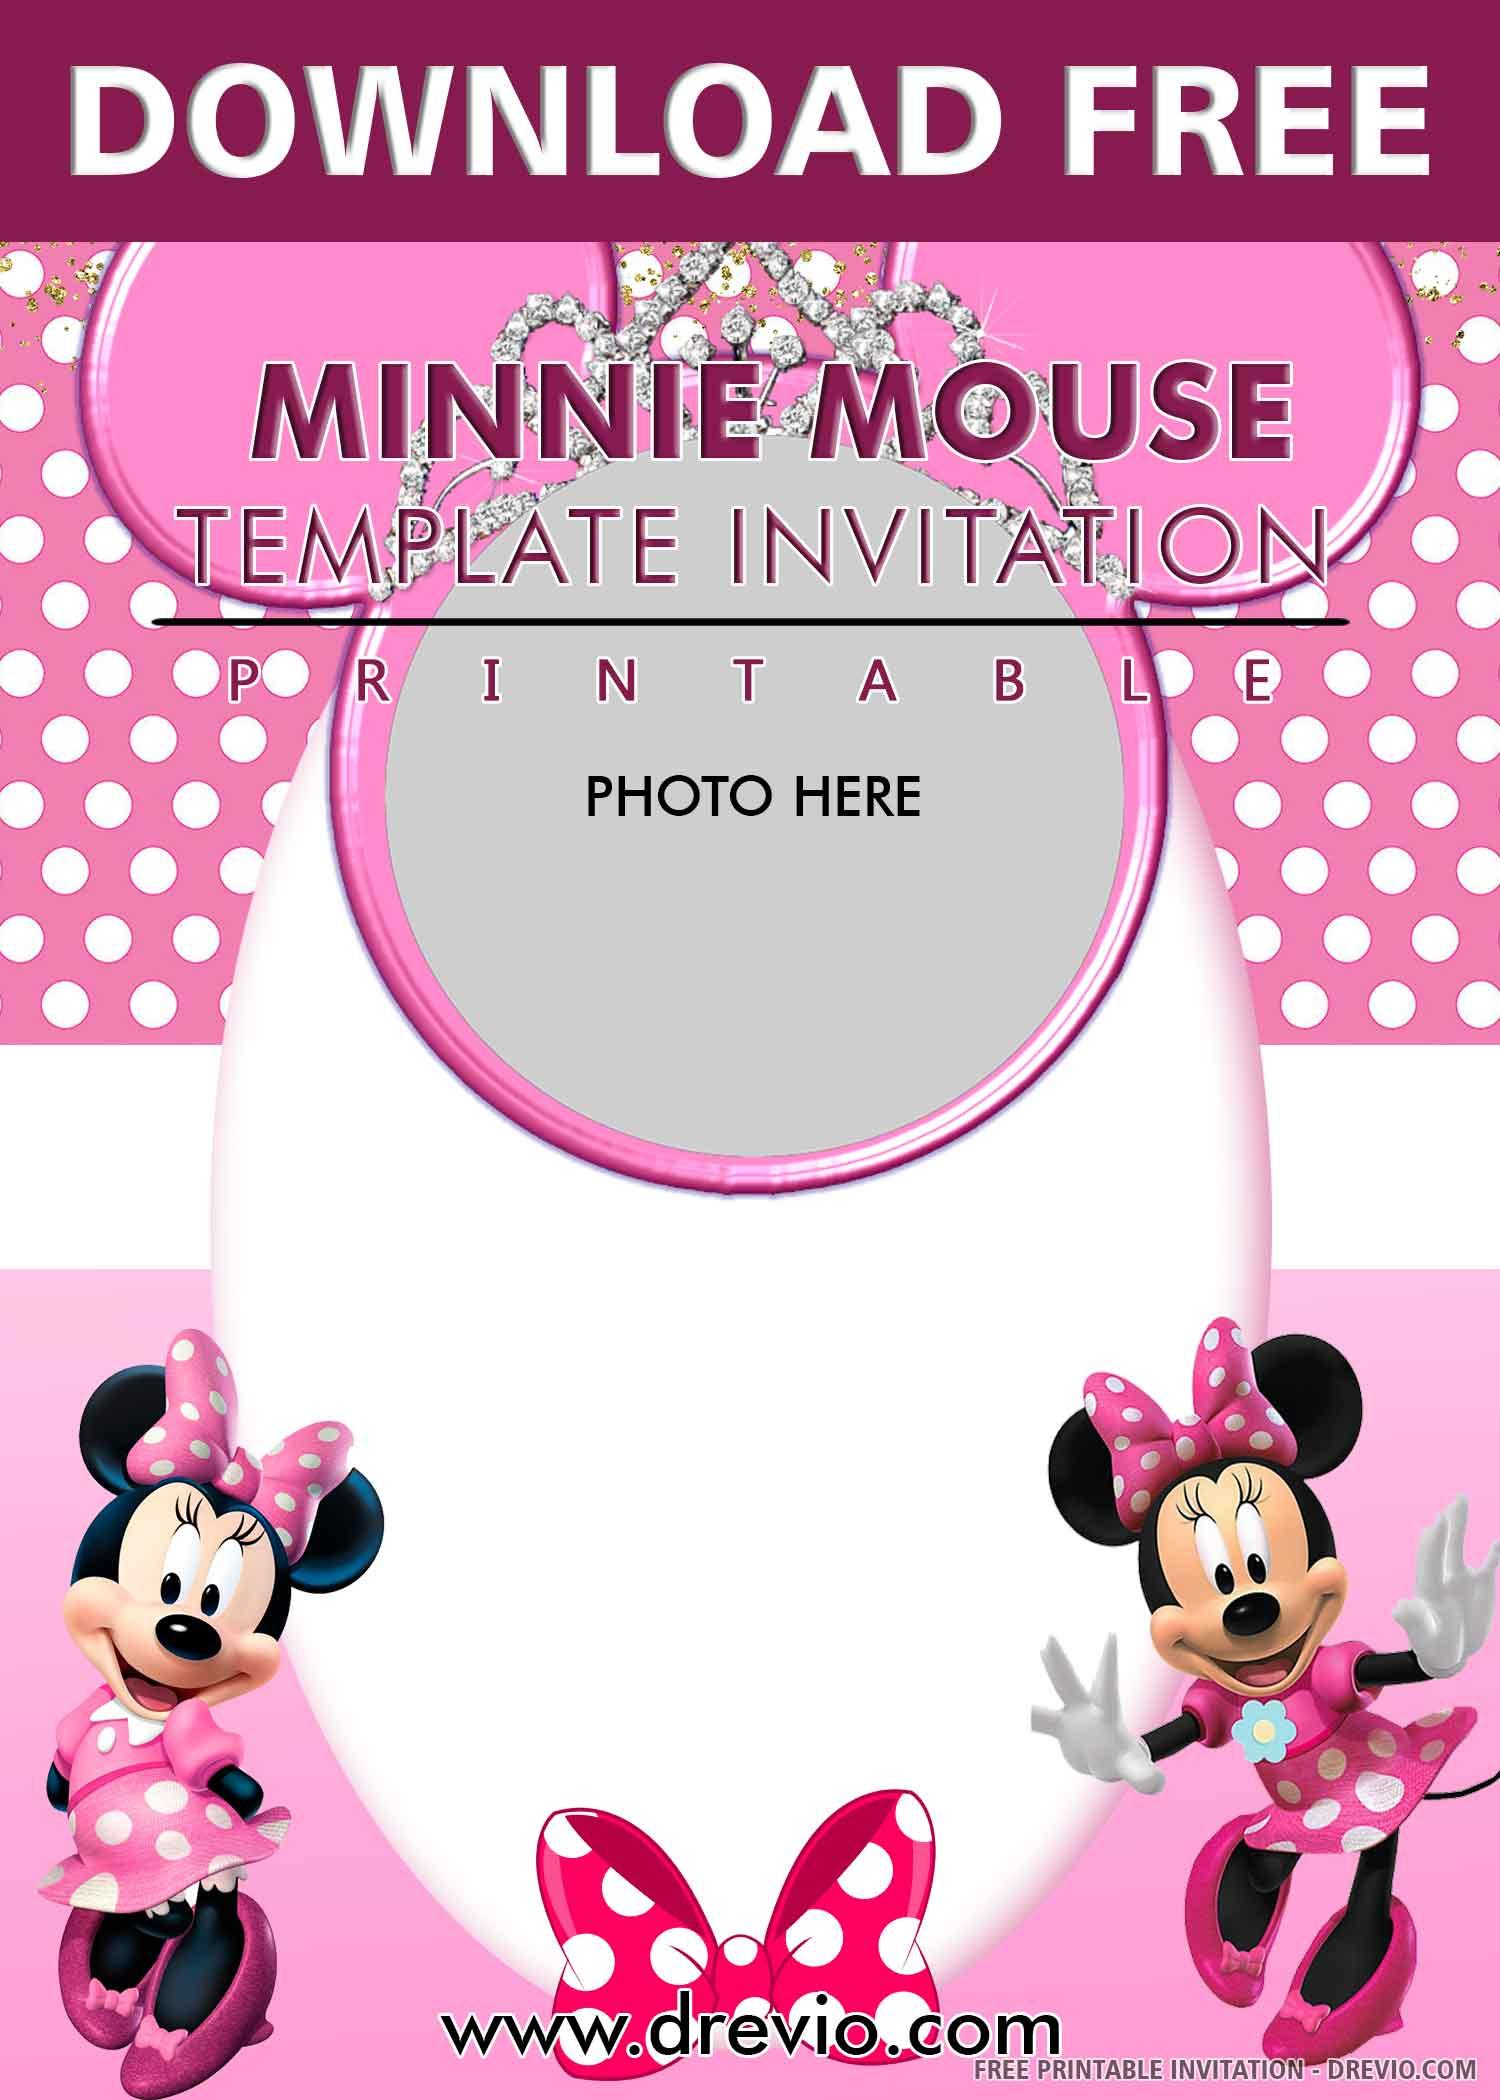 Free Printable Minnie Mouse S Pink Bandana Birthday